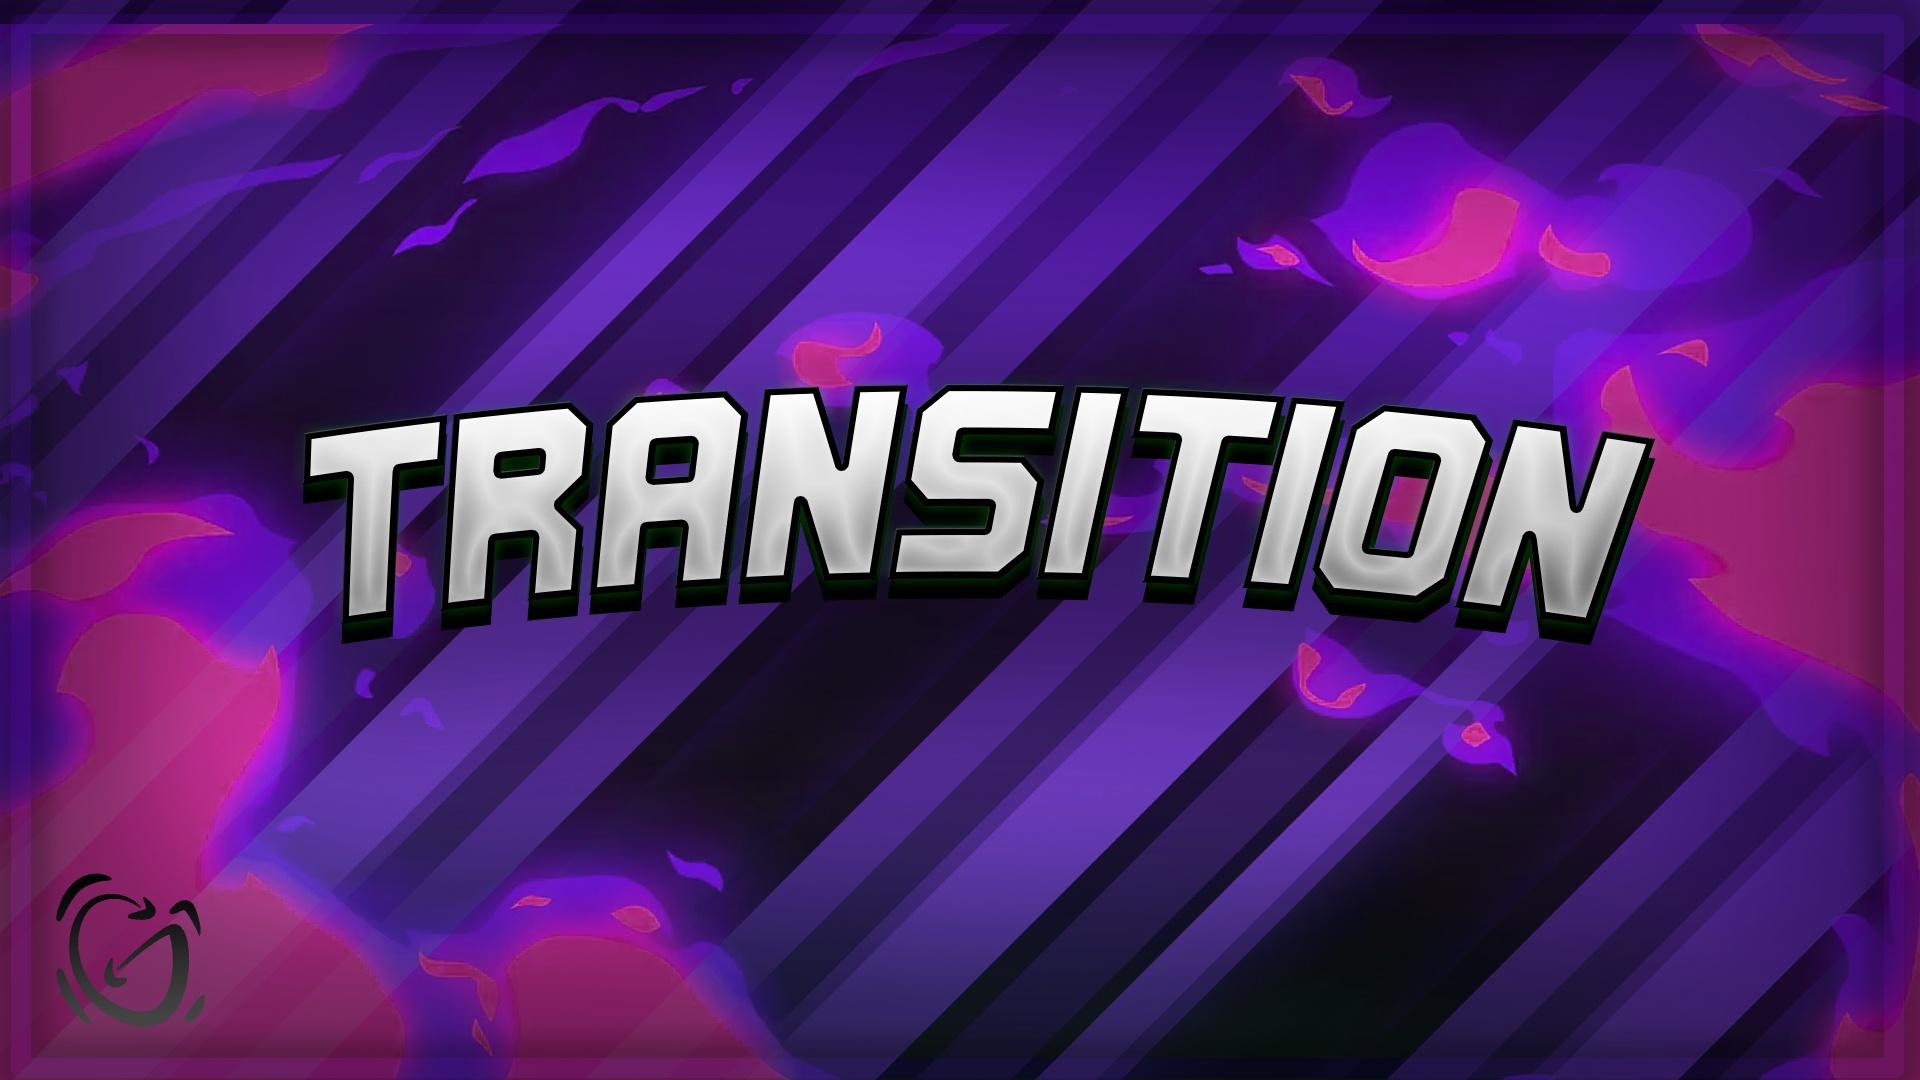 2D Transition